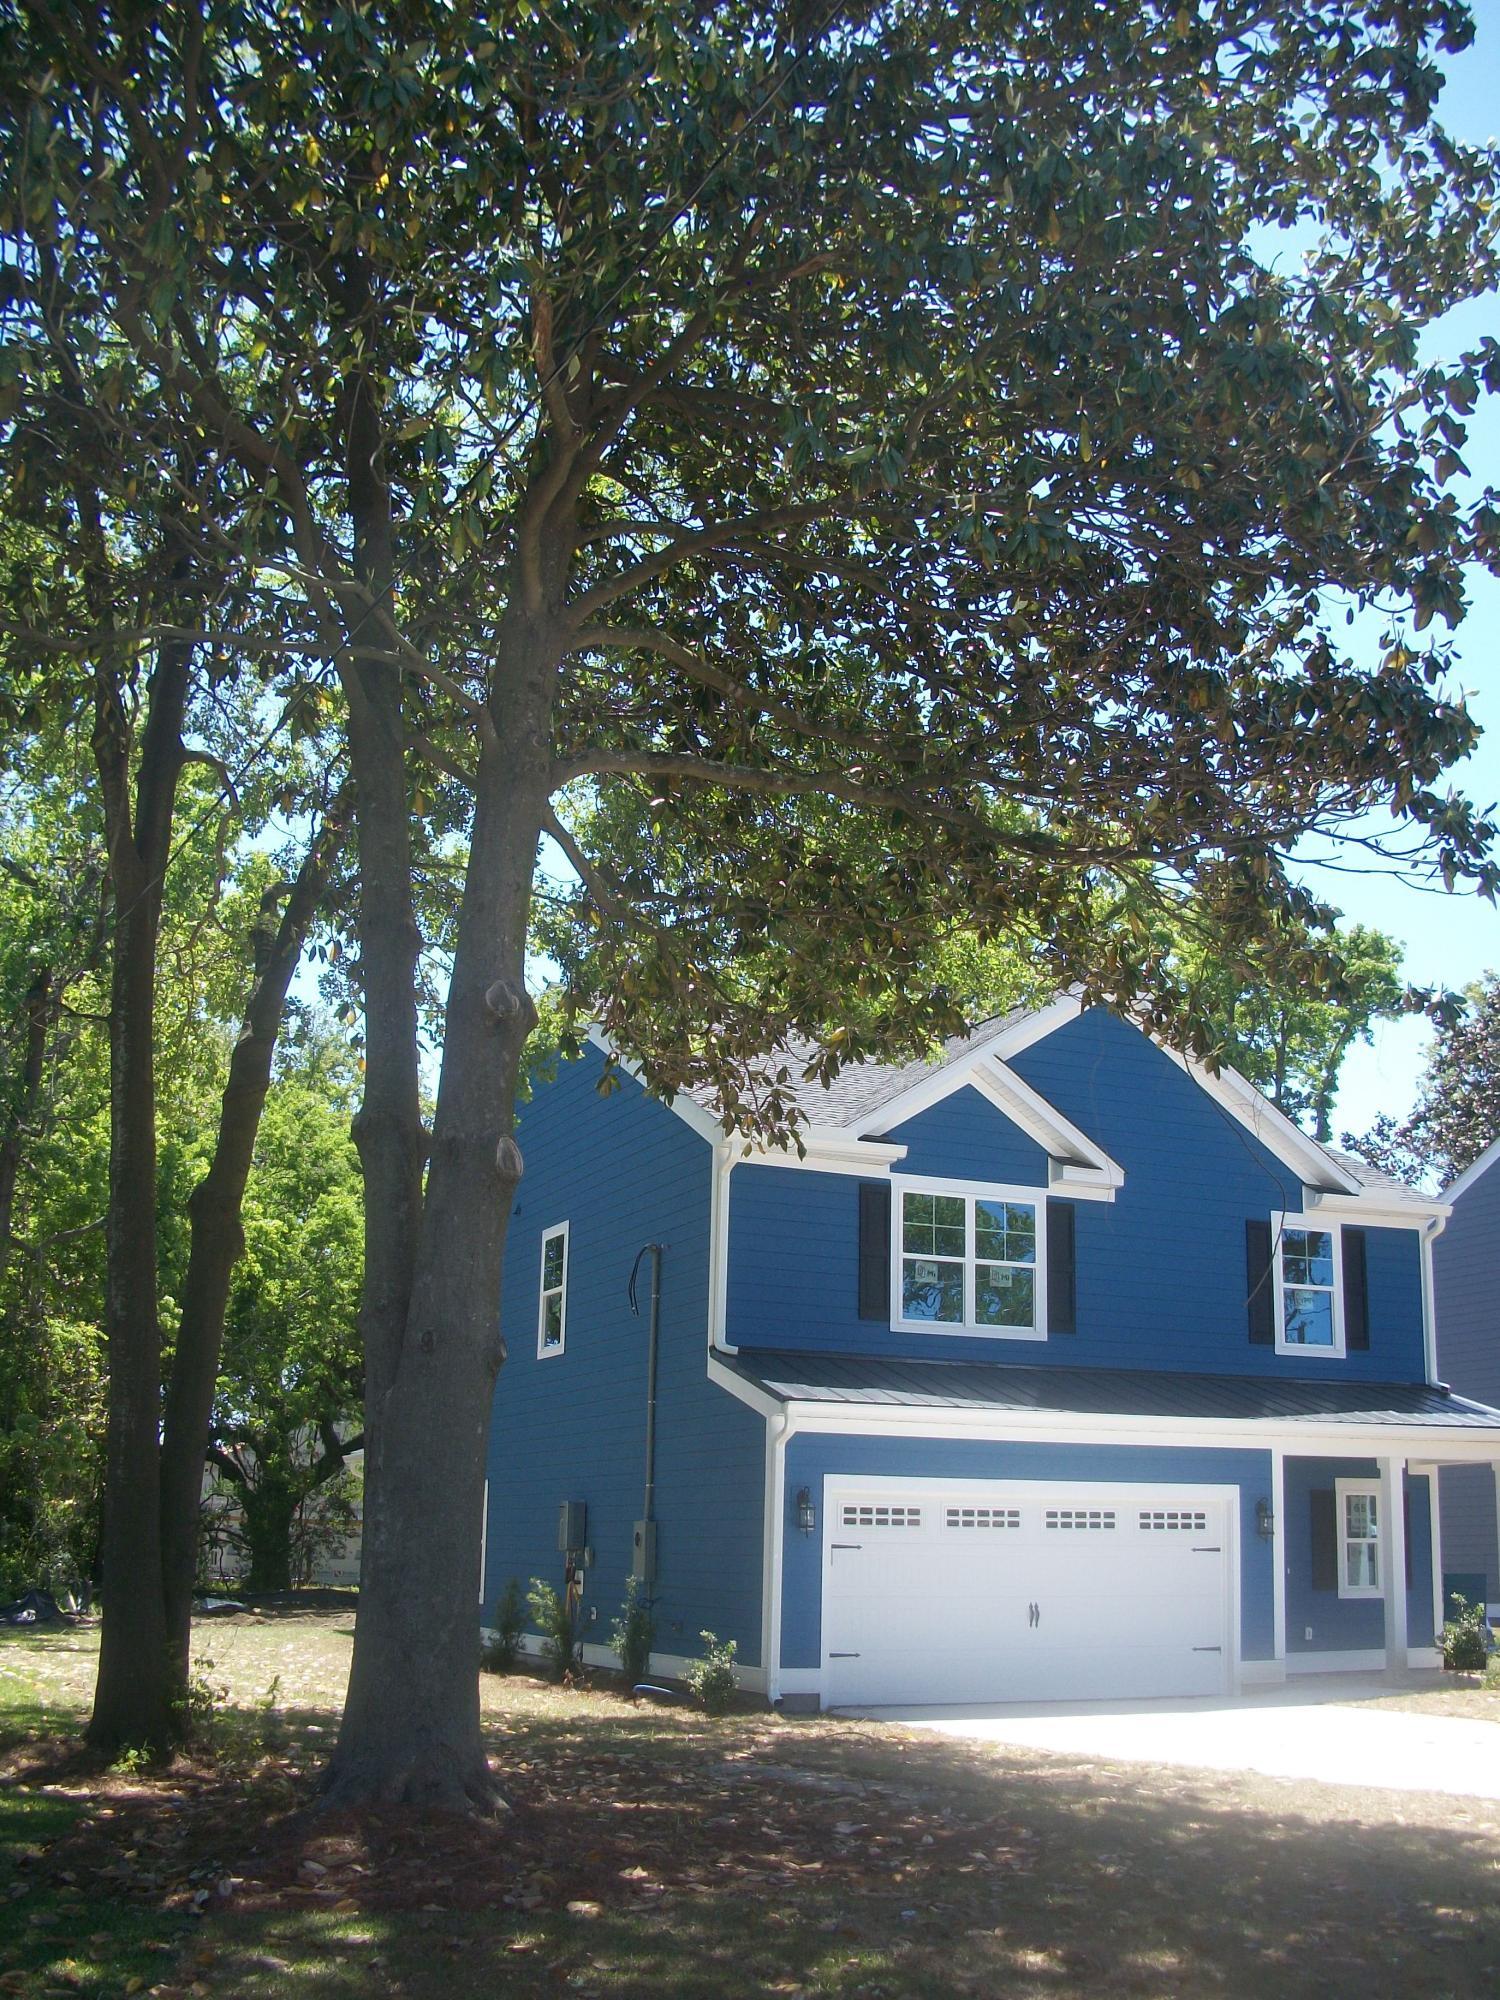 Filbin Creek Homes For Sale - 1173 Sumner, North Charleston, SC - 2